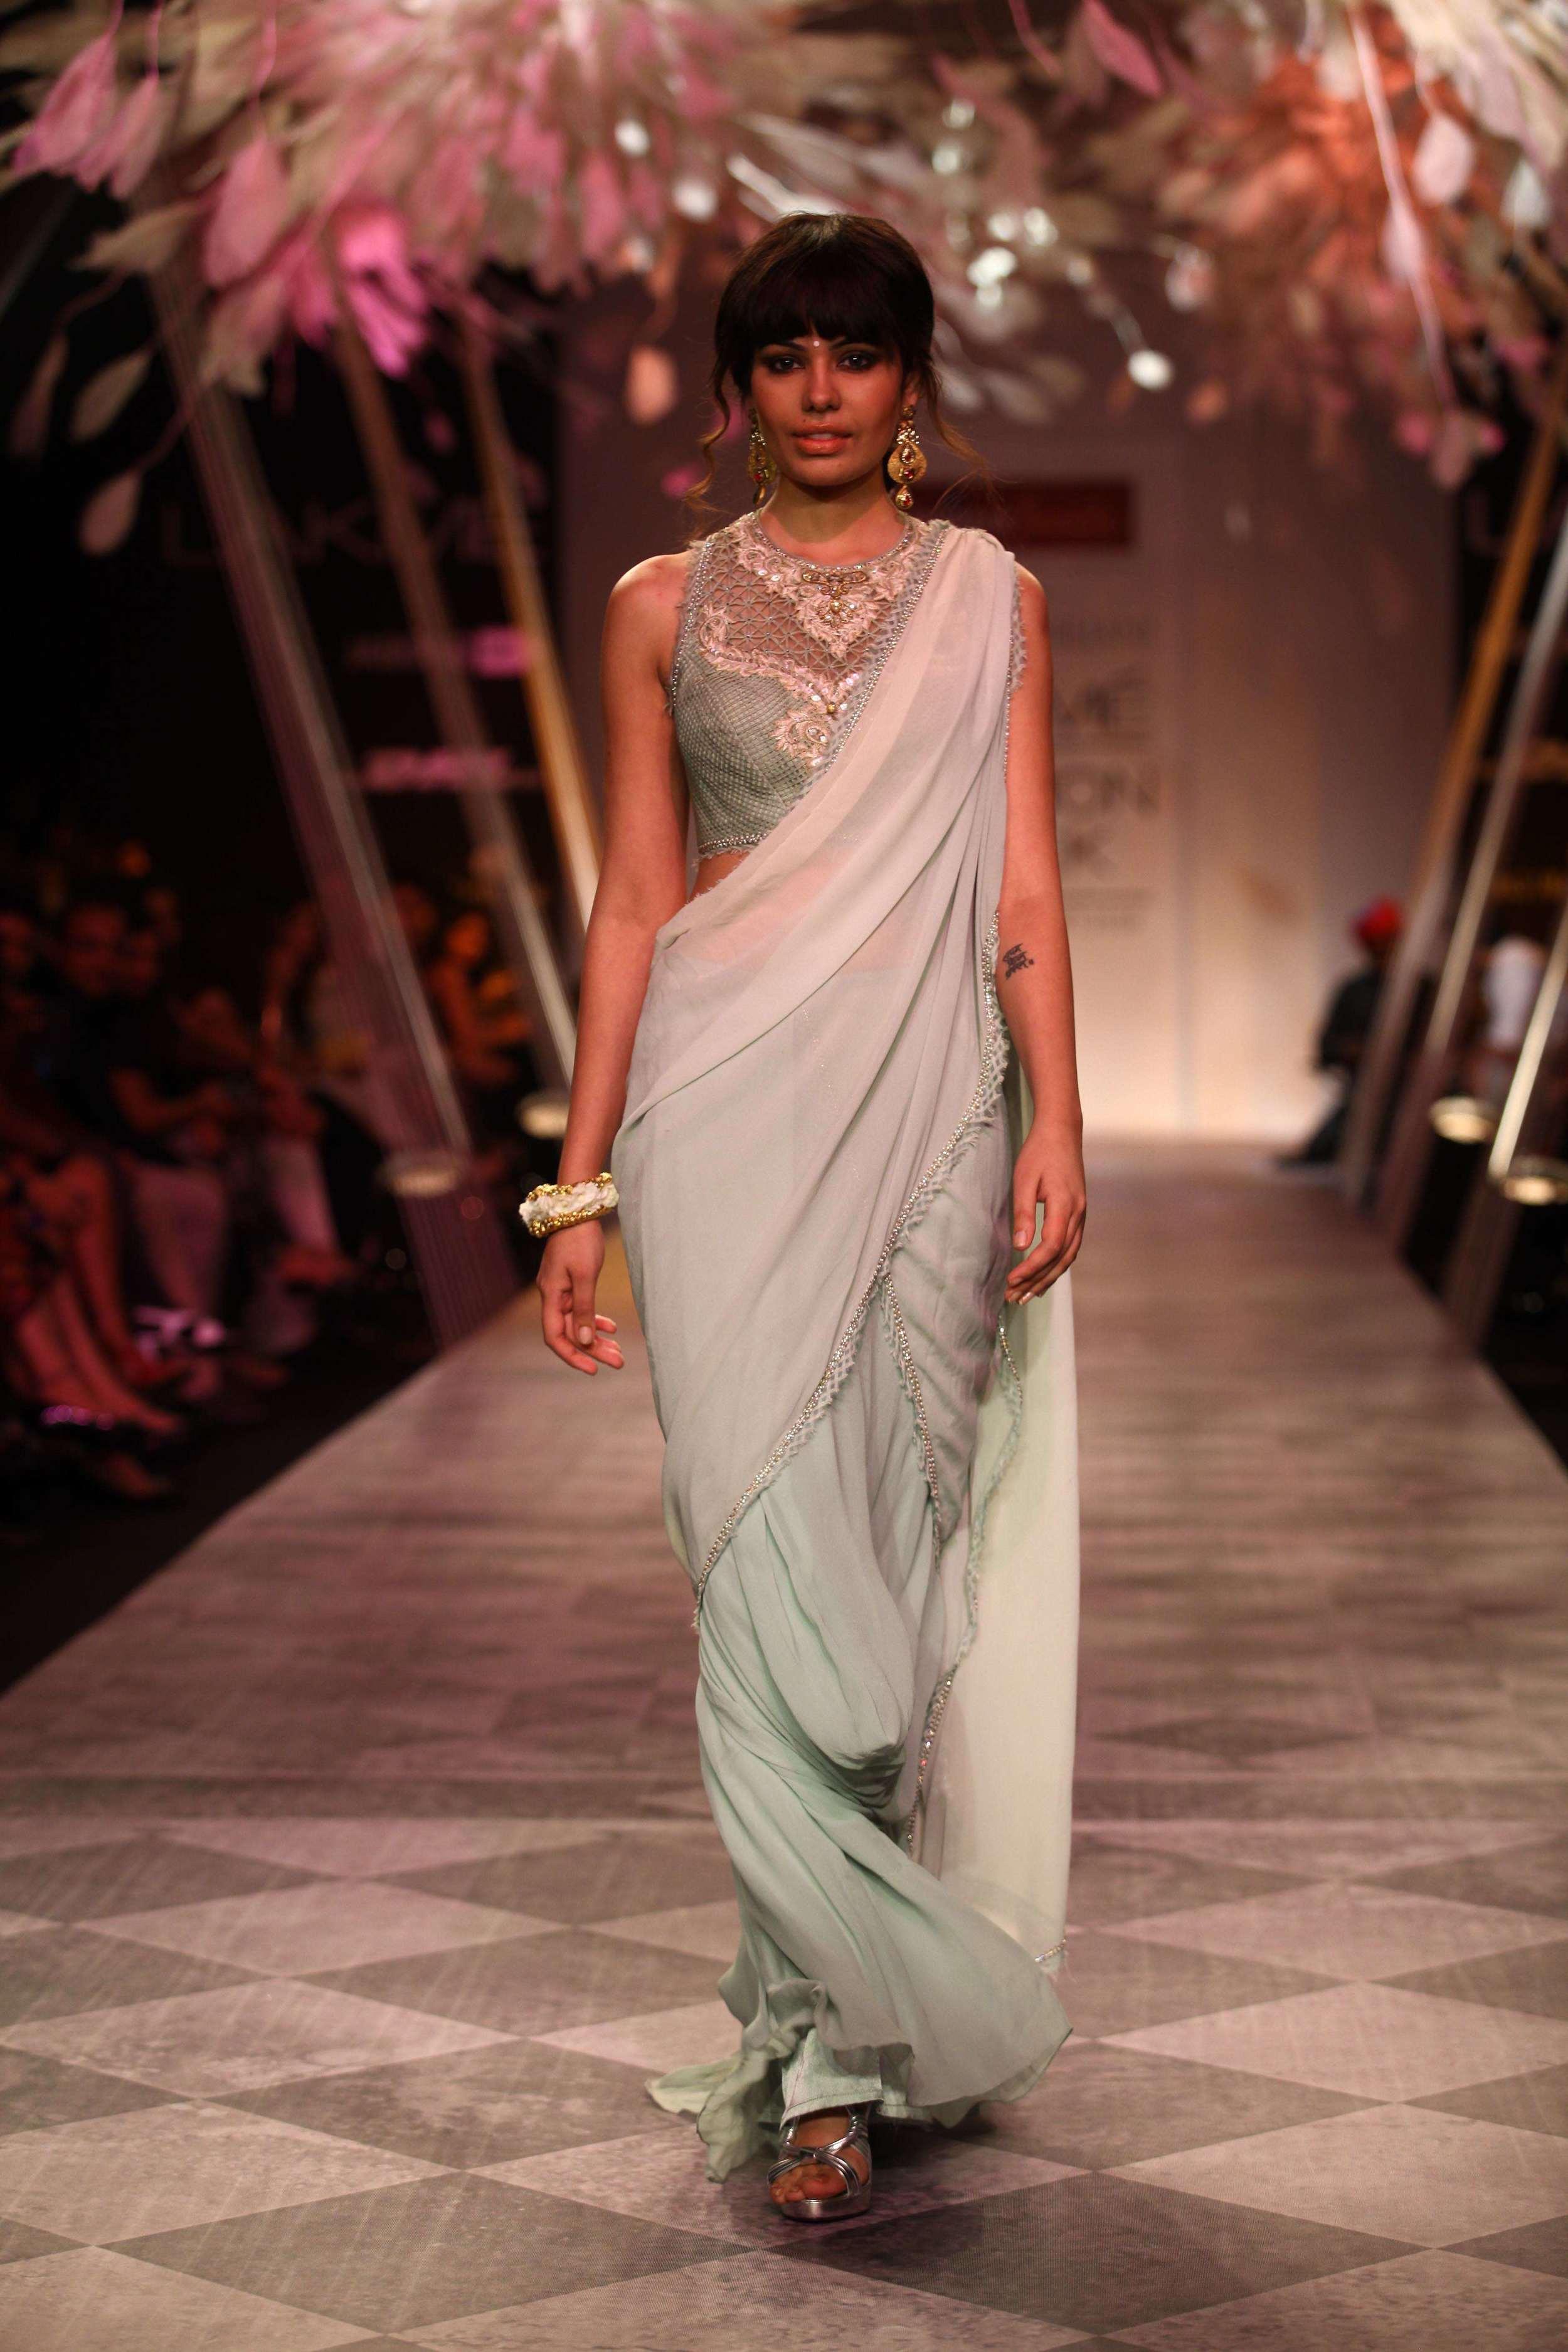 Tarun Tahiliani SS'14 Collection at LFW SR 2014 17.jpg